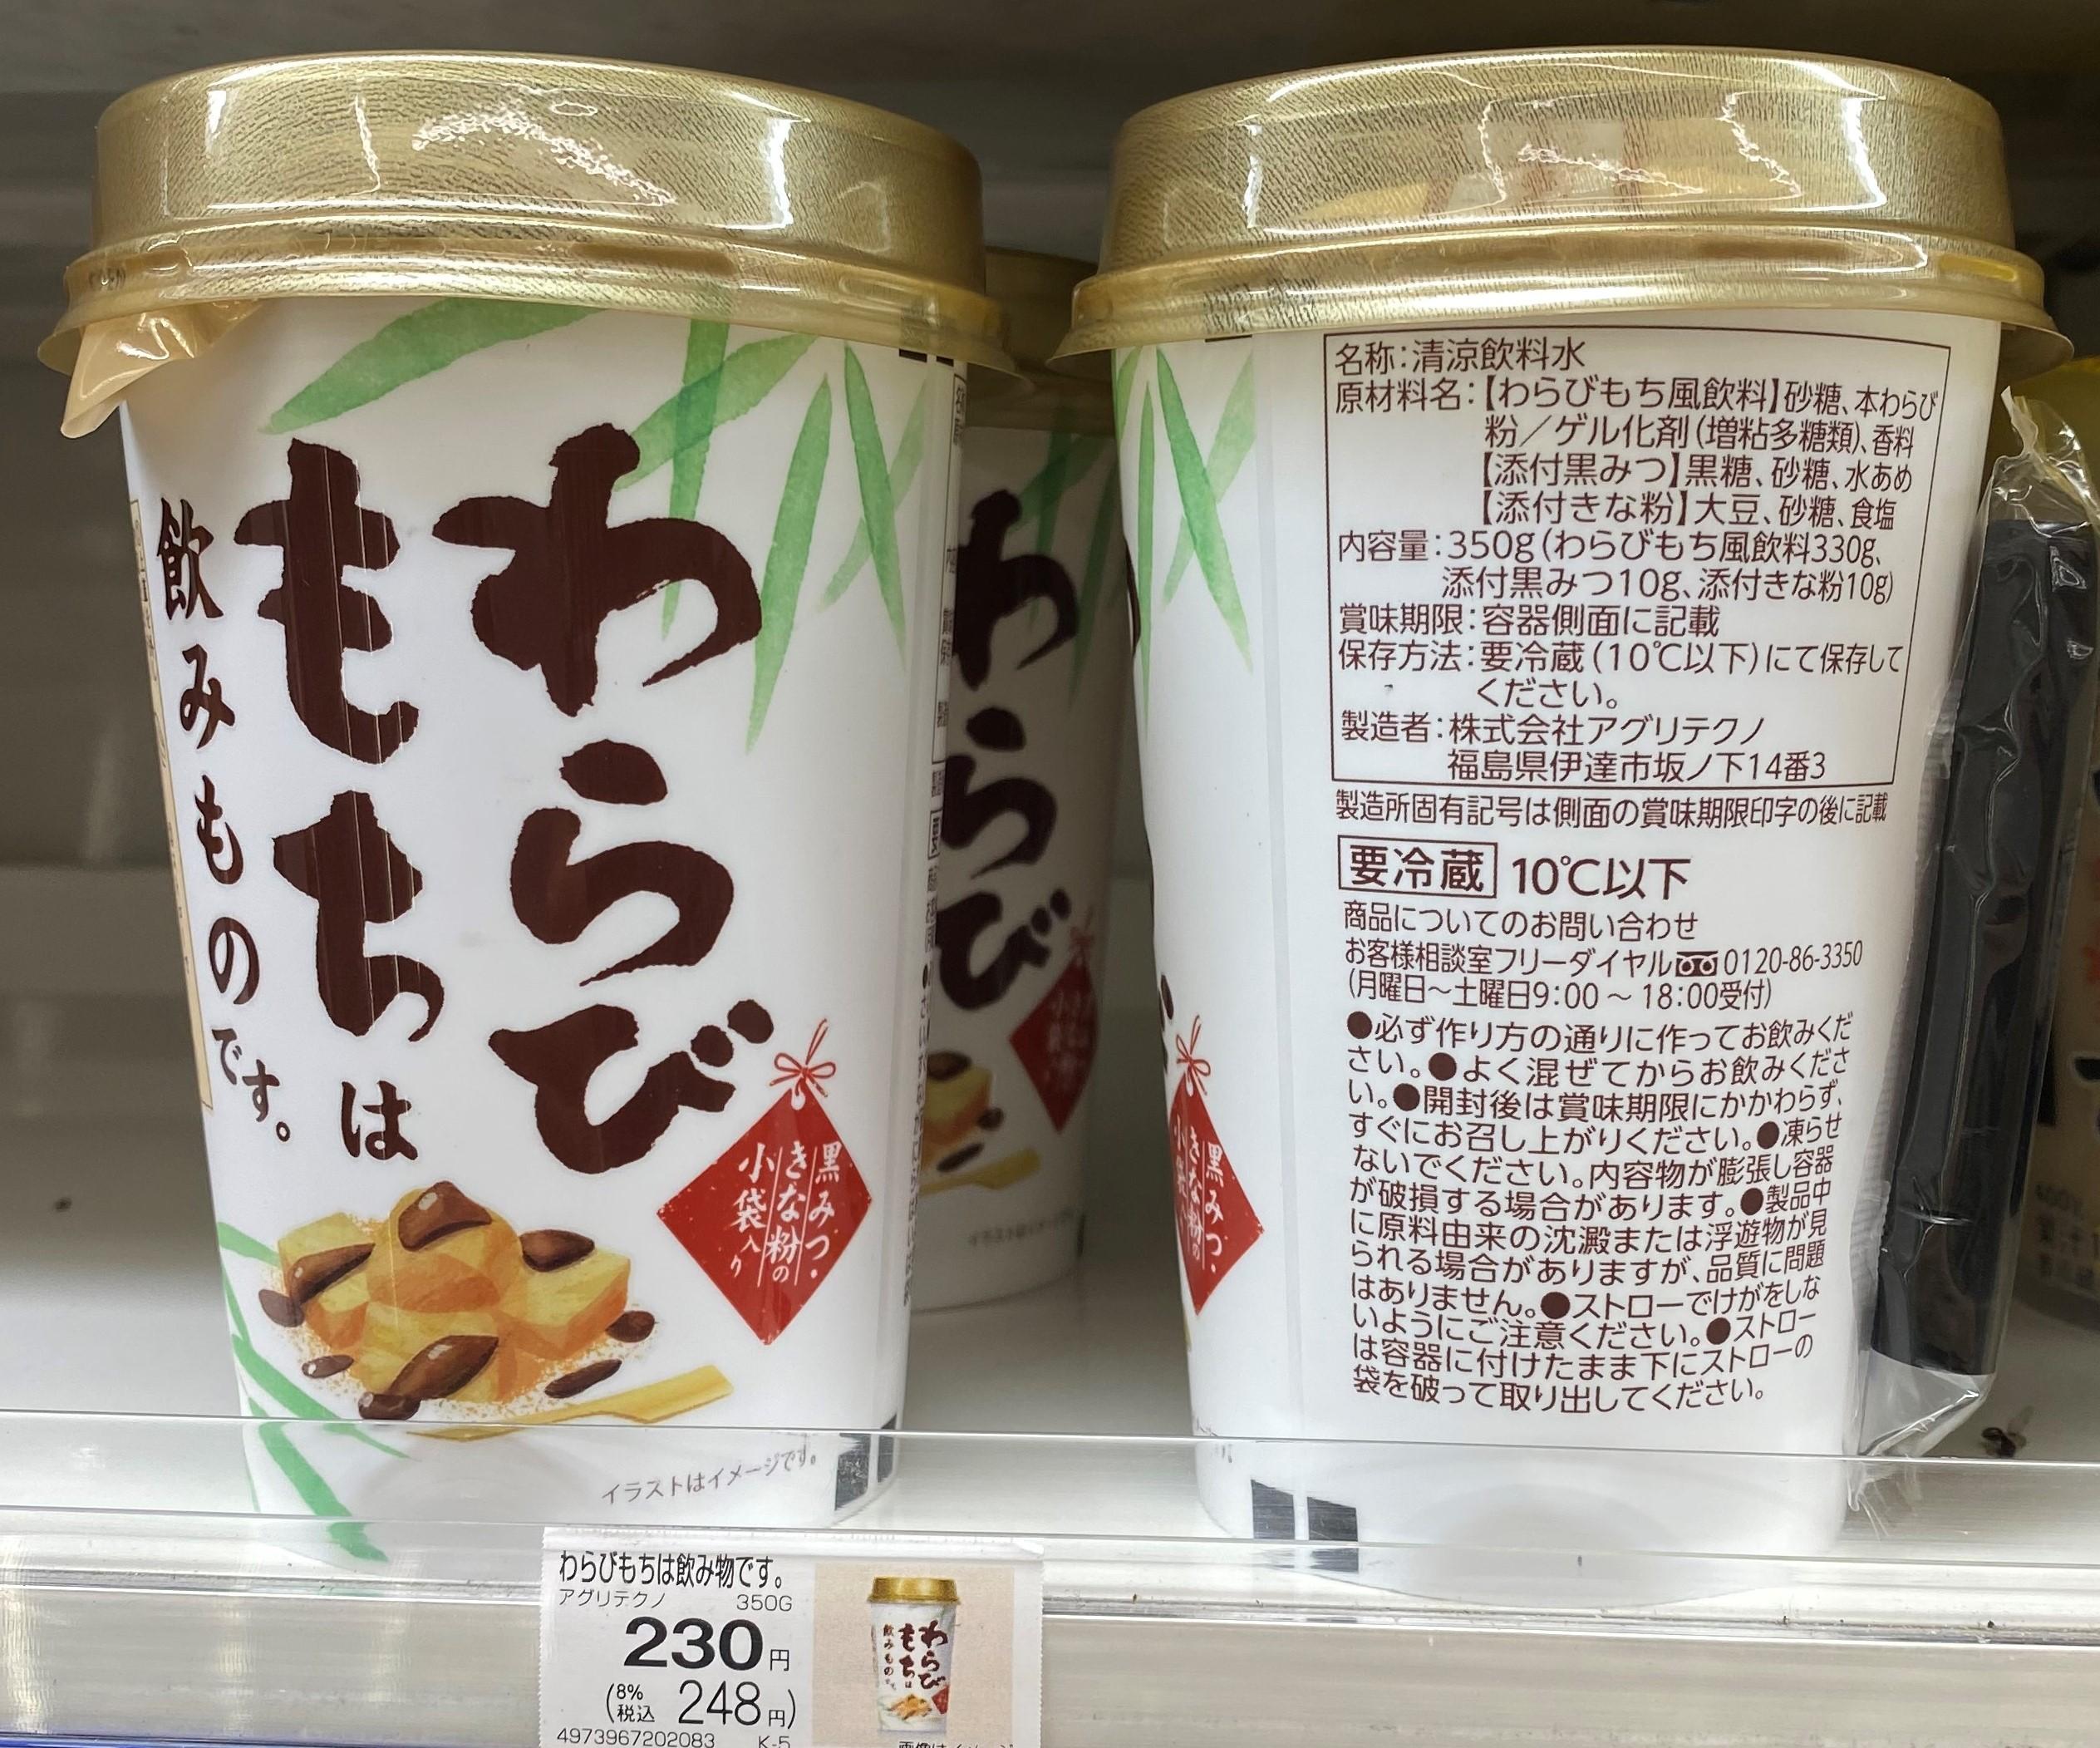 warabi mochi drink family mart